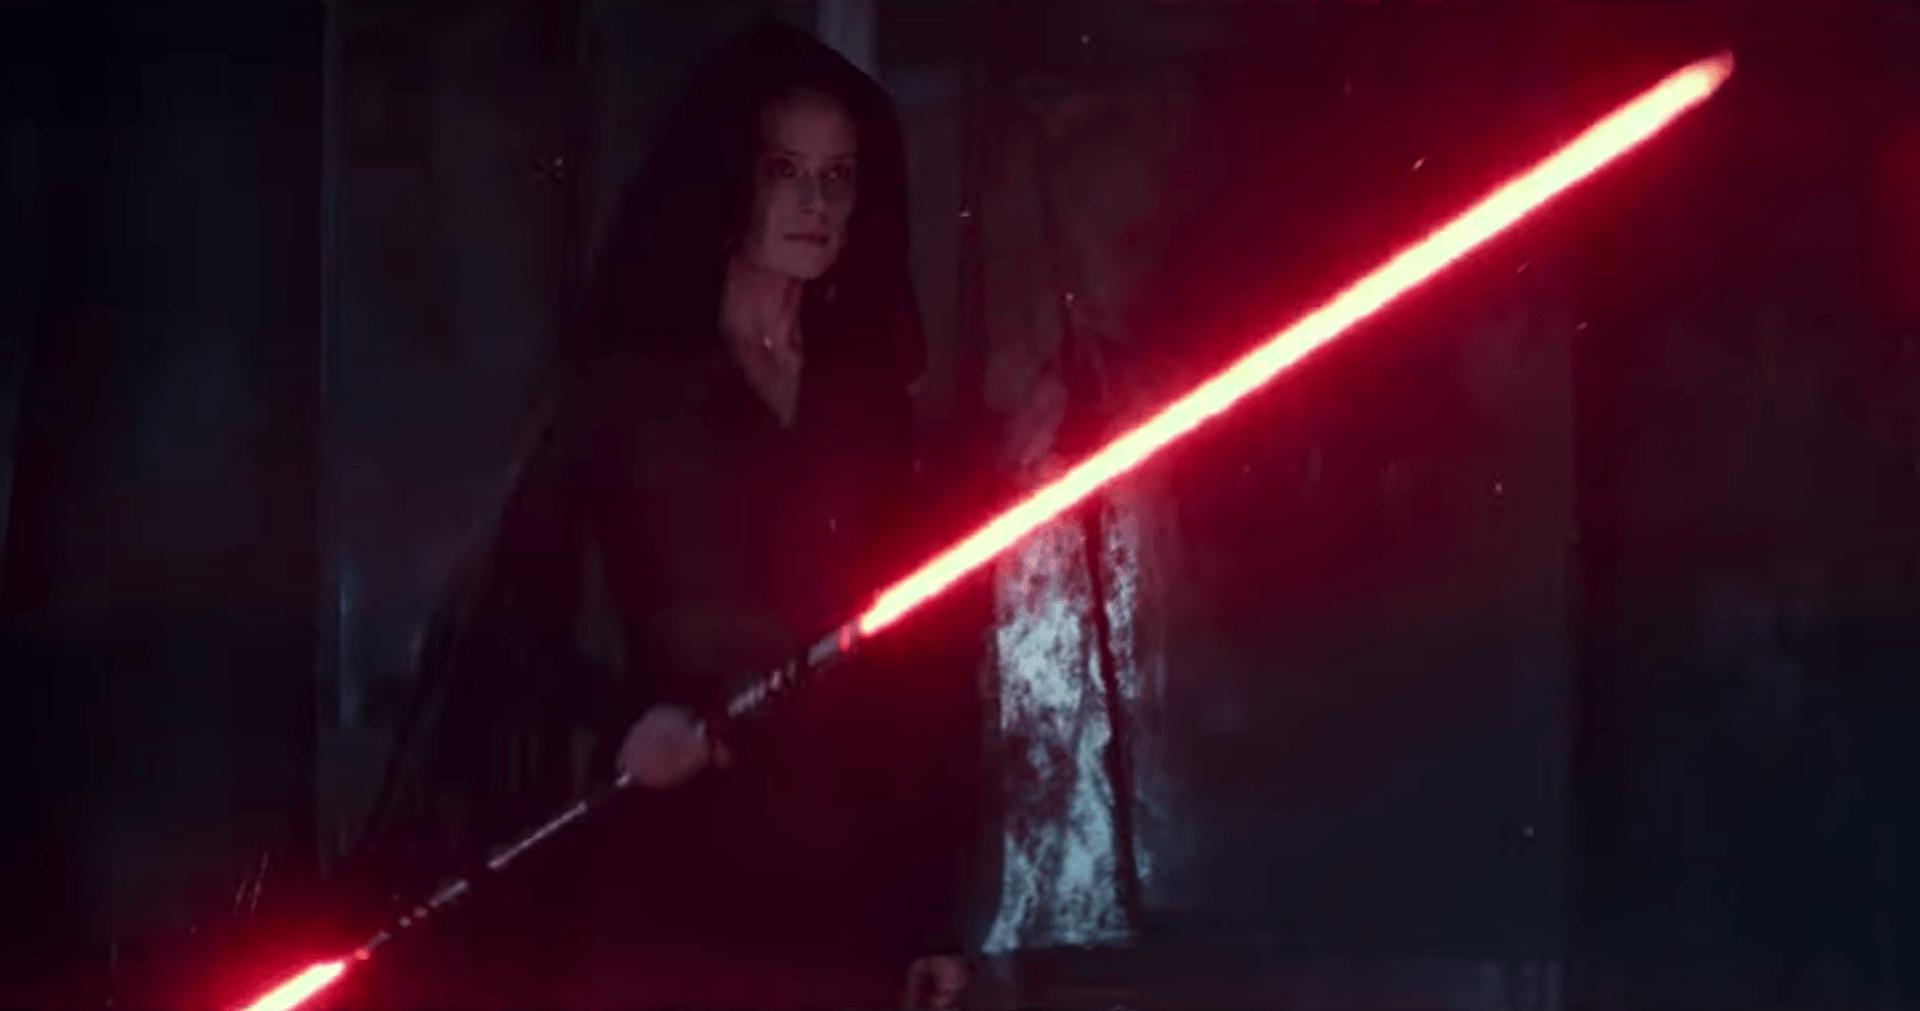 Dark Rey (Daisy Ridley) - Star Wars IX : L'Ascension de Skywalker